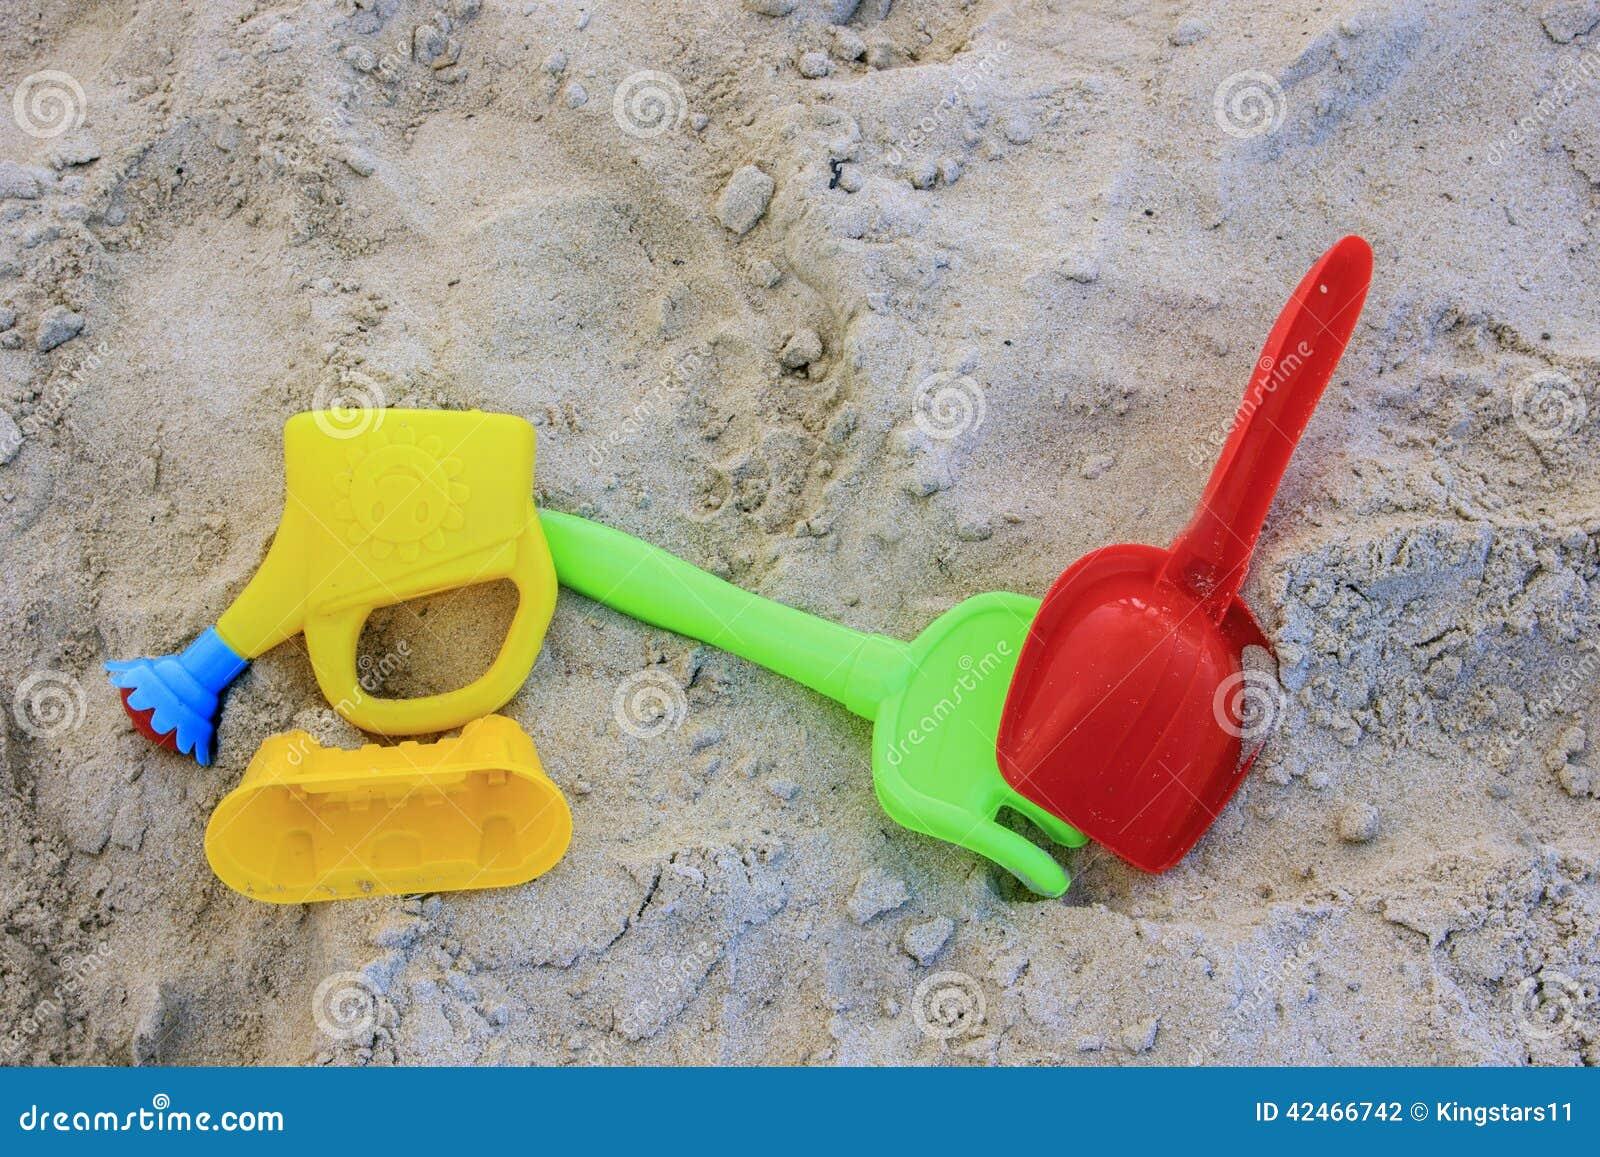 Strandplastikspielwaren